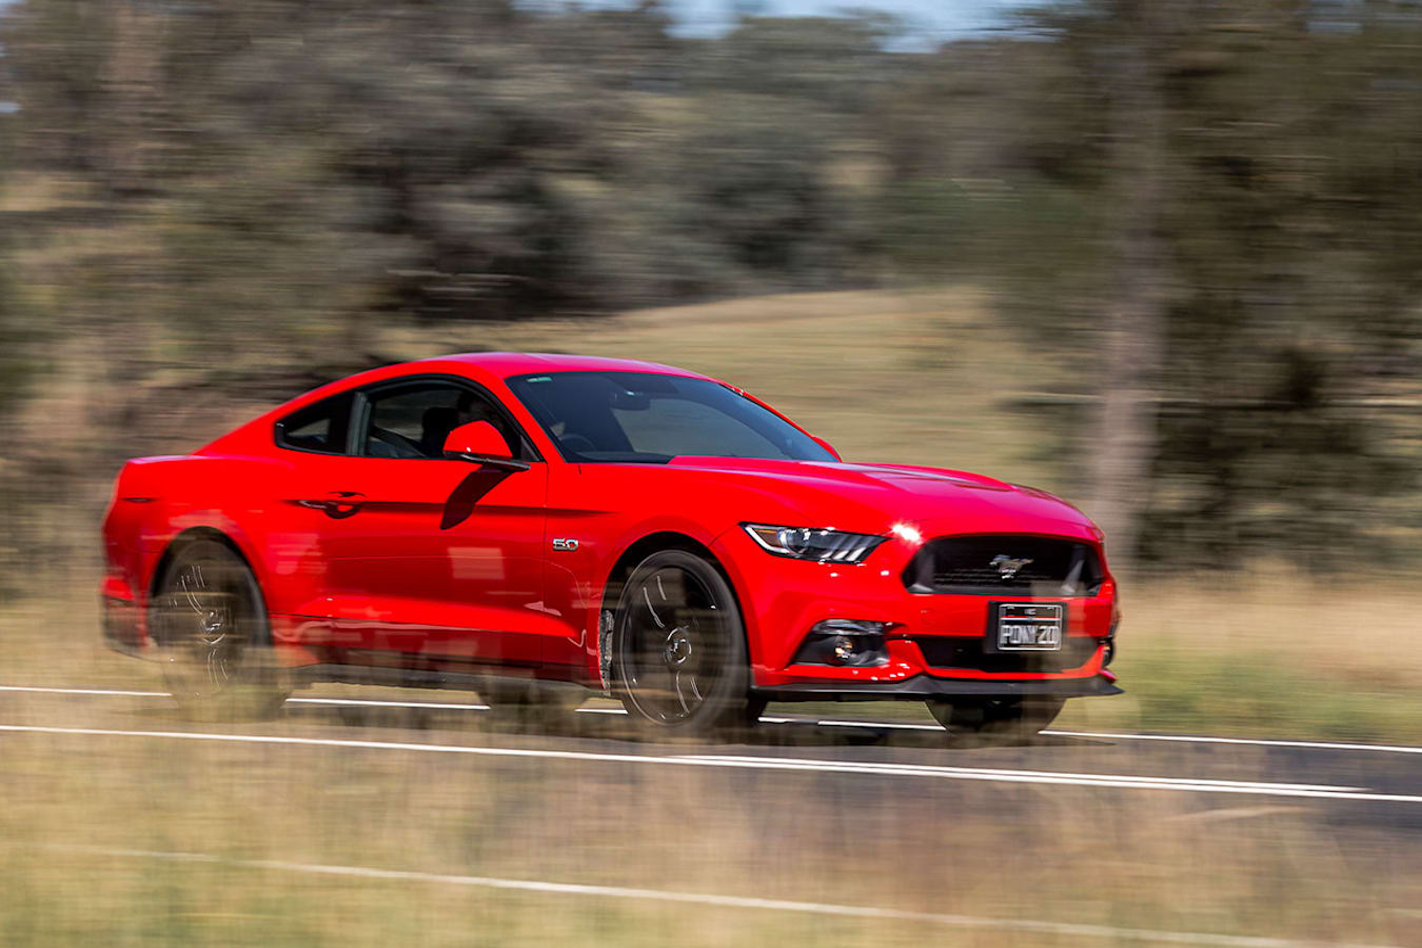 2016 Mustang GT Fastback